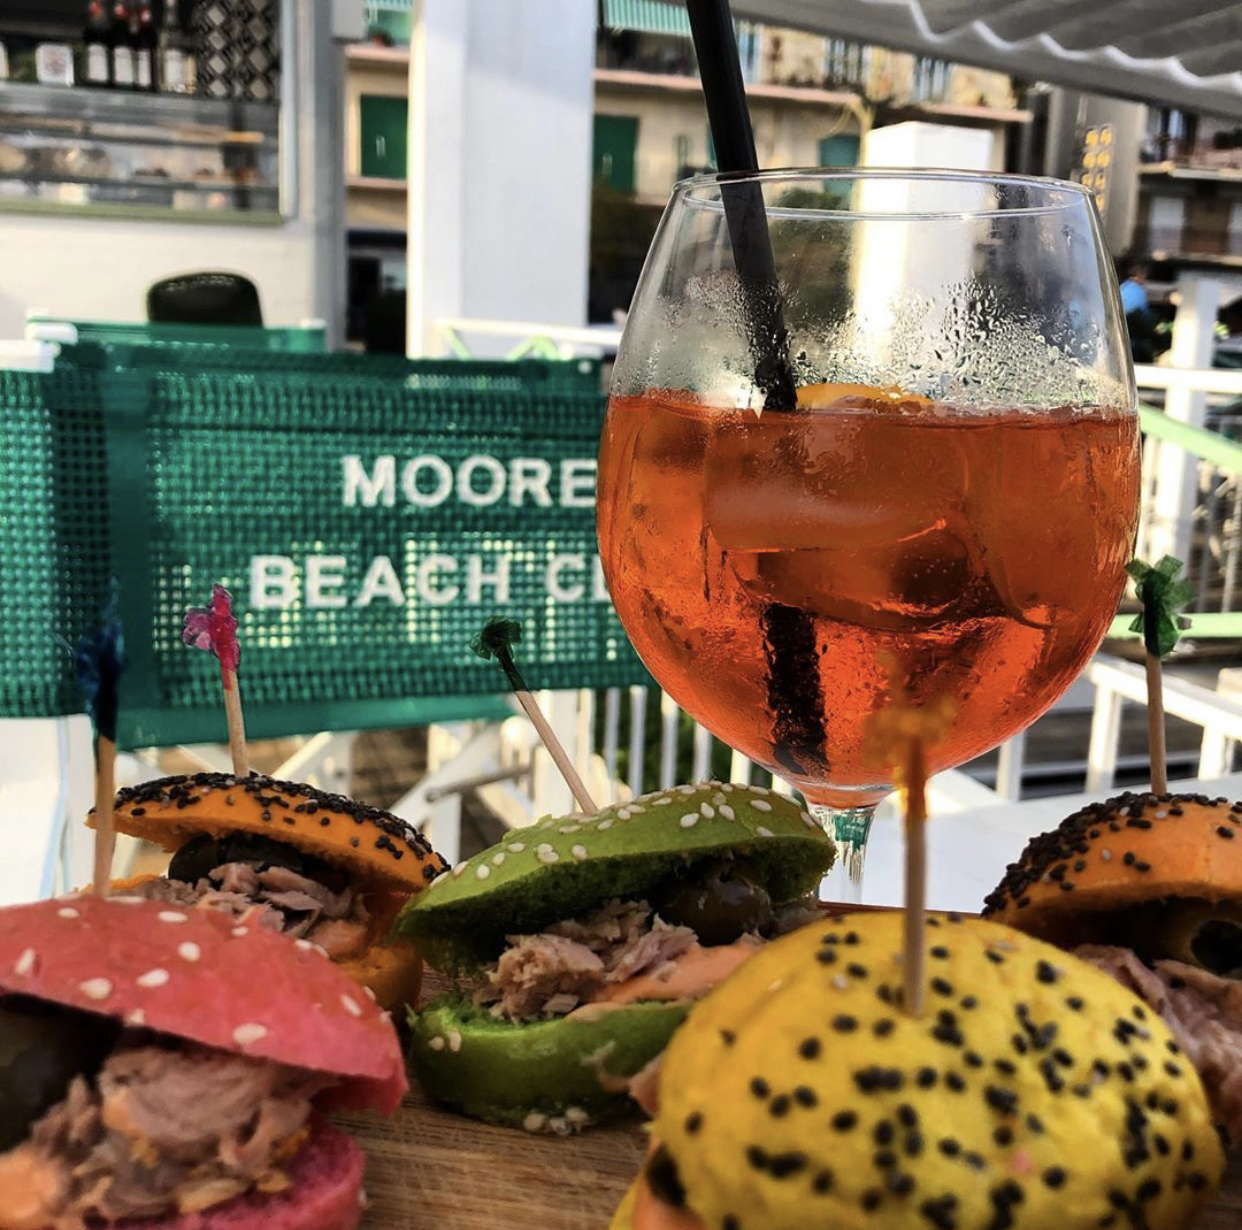 Moorea Beach Club